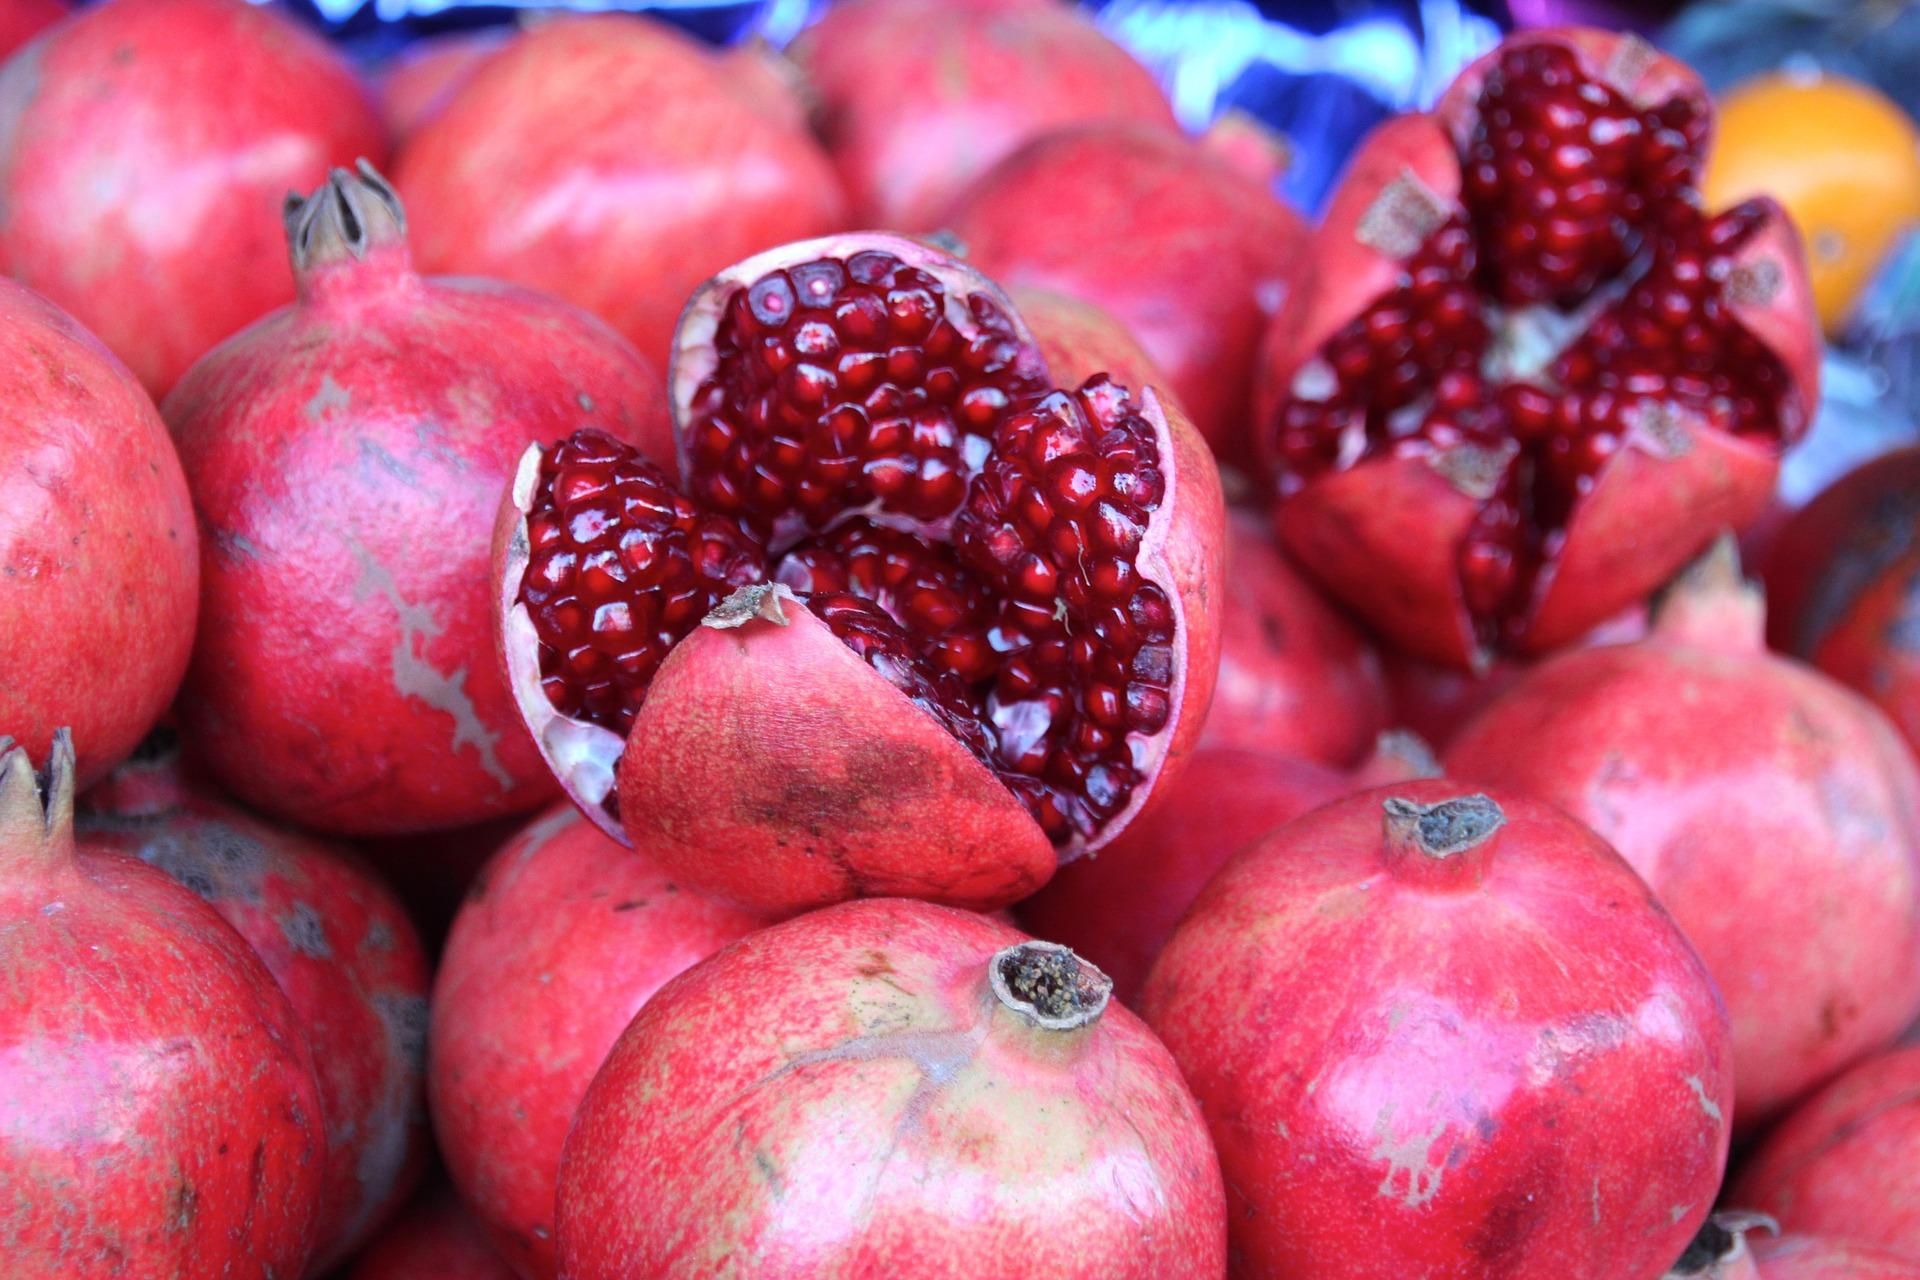 Pomegranate Backgrounds, Compatible - PC, Mobile, Gadgets| 1920x1280 px